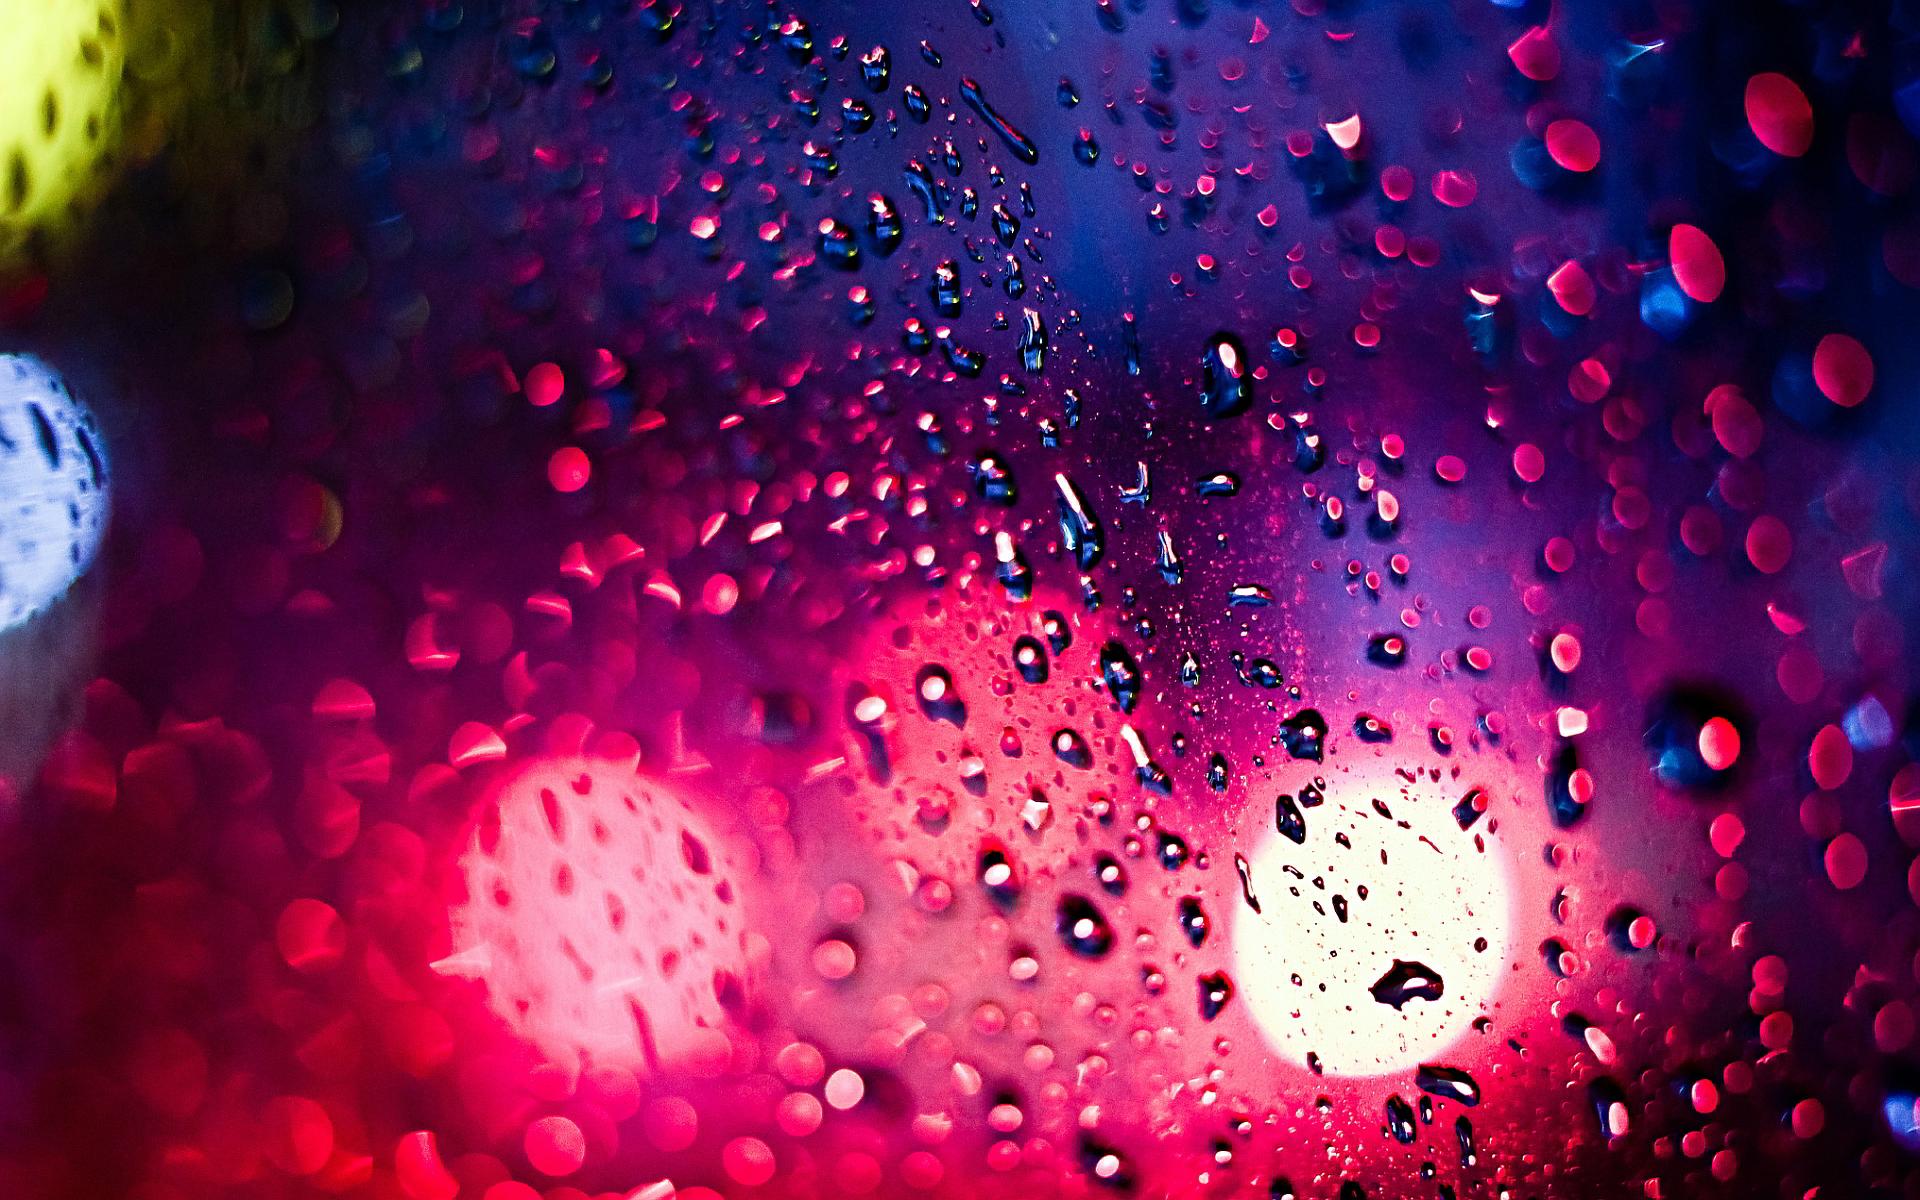 Pink window drops